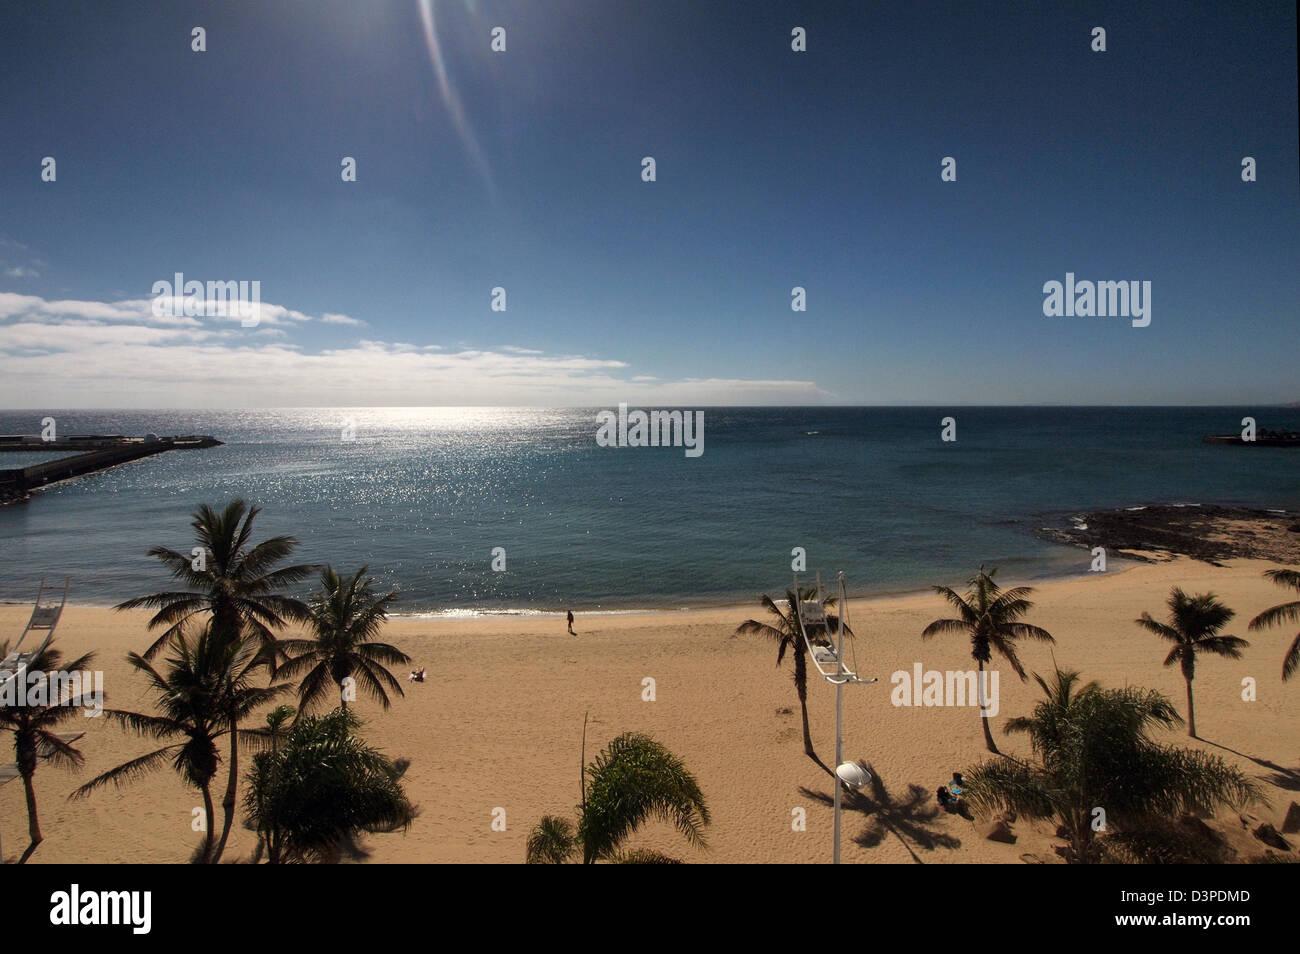 beach at arrecife lanzarote, canary islands, spain - Stock Image